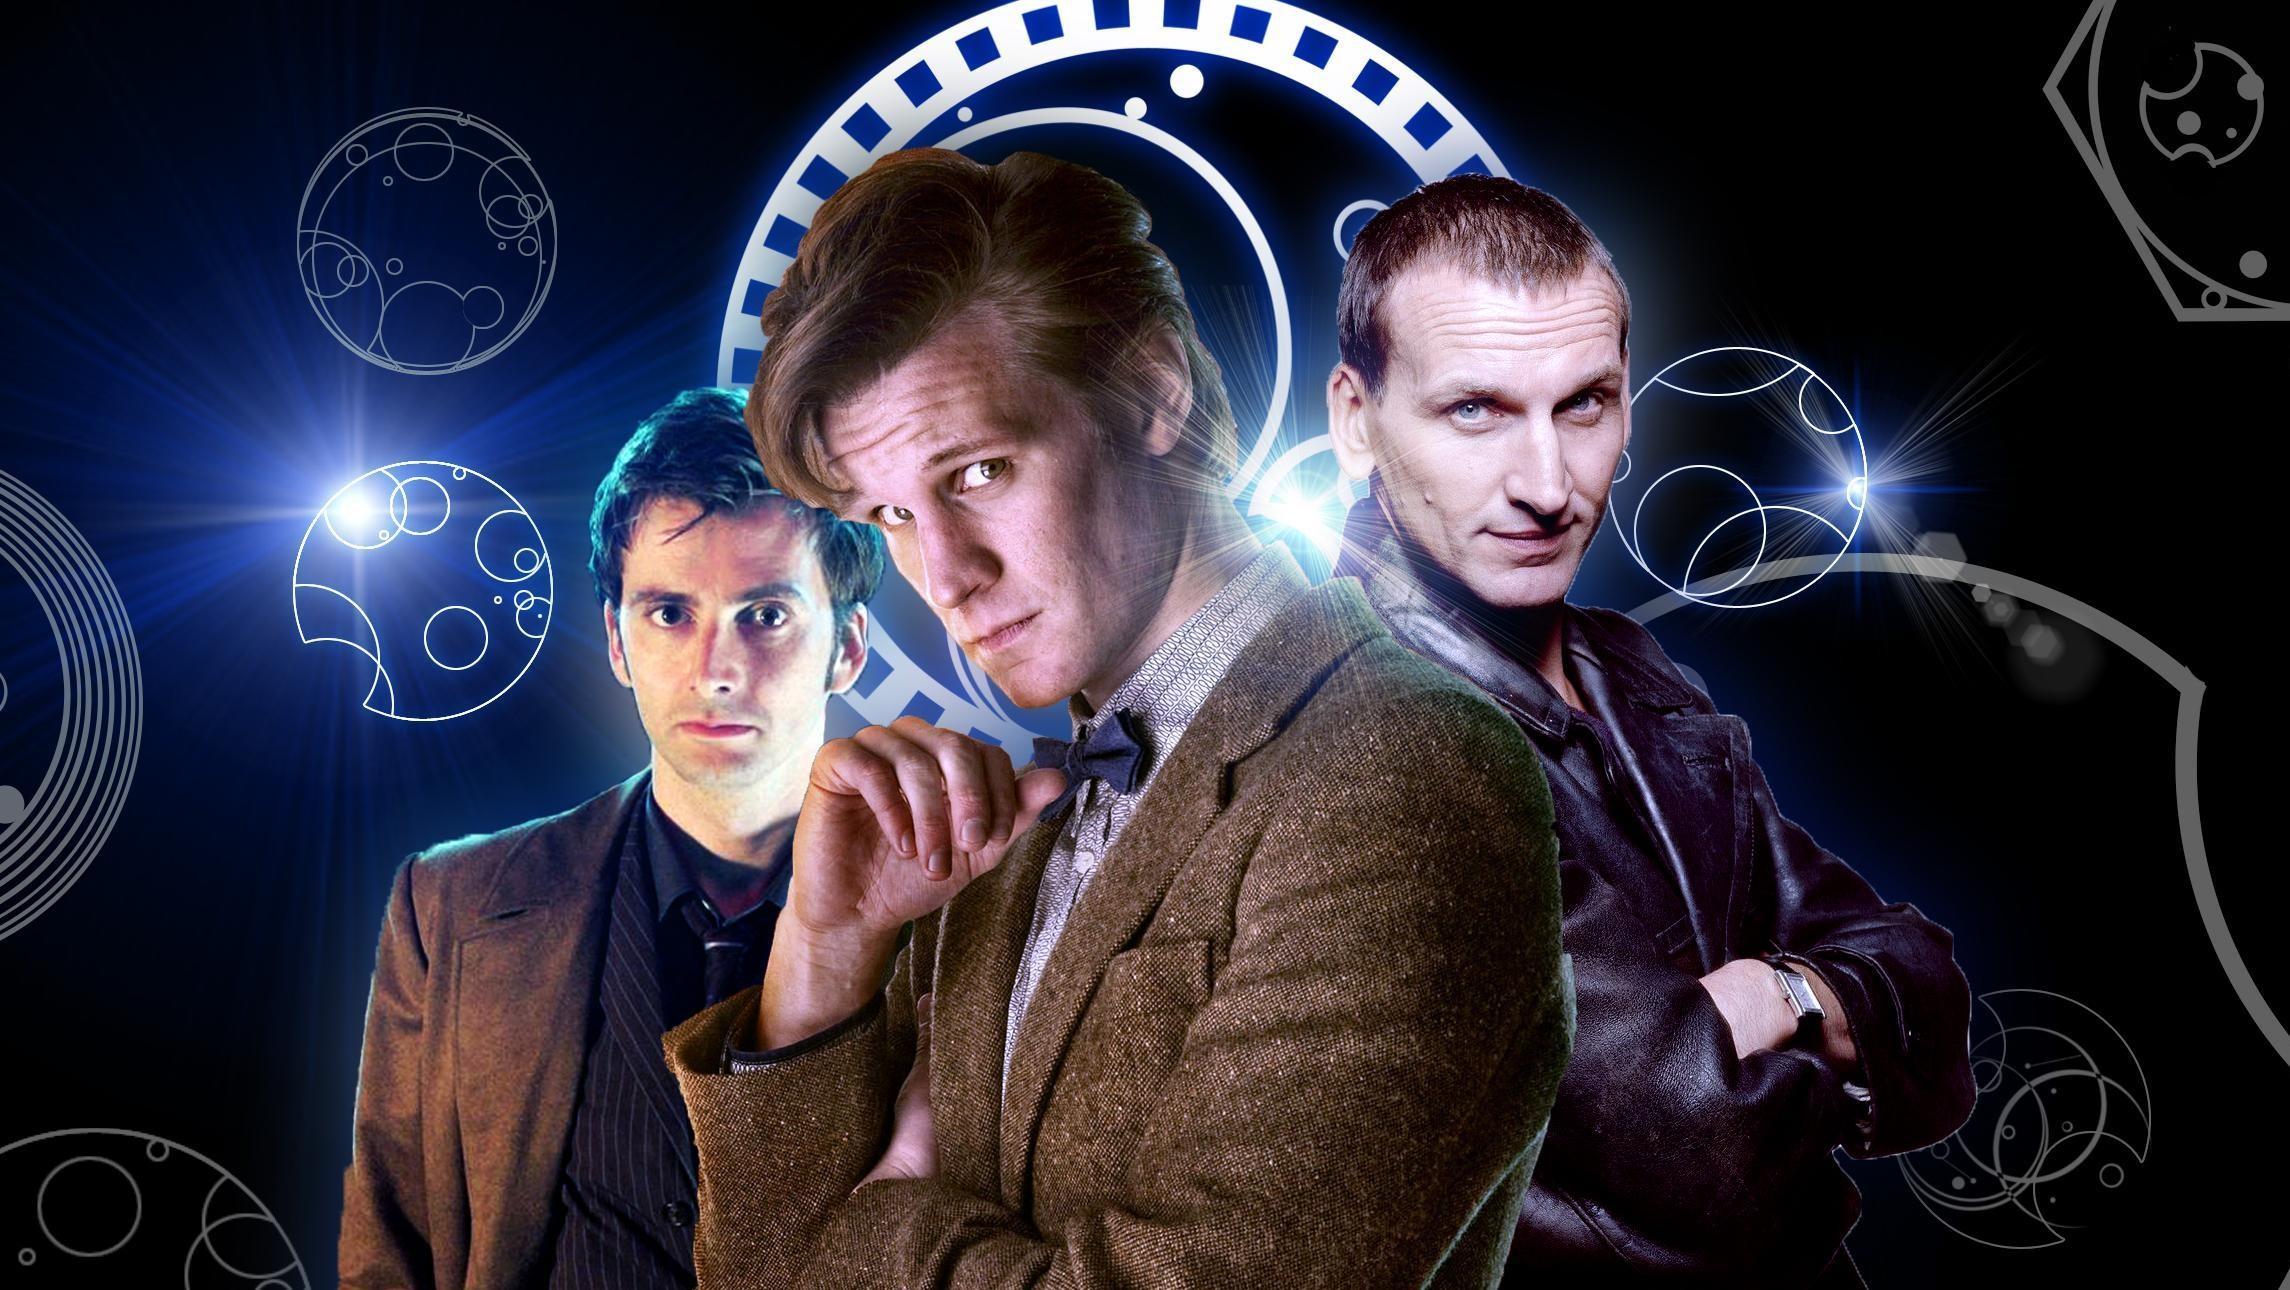 Doctor Who Matt Smith and Karen Gillan HD desktop wallpaper High